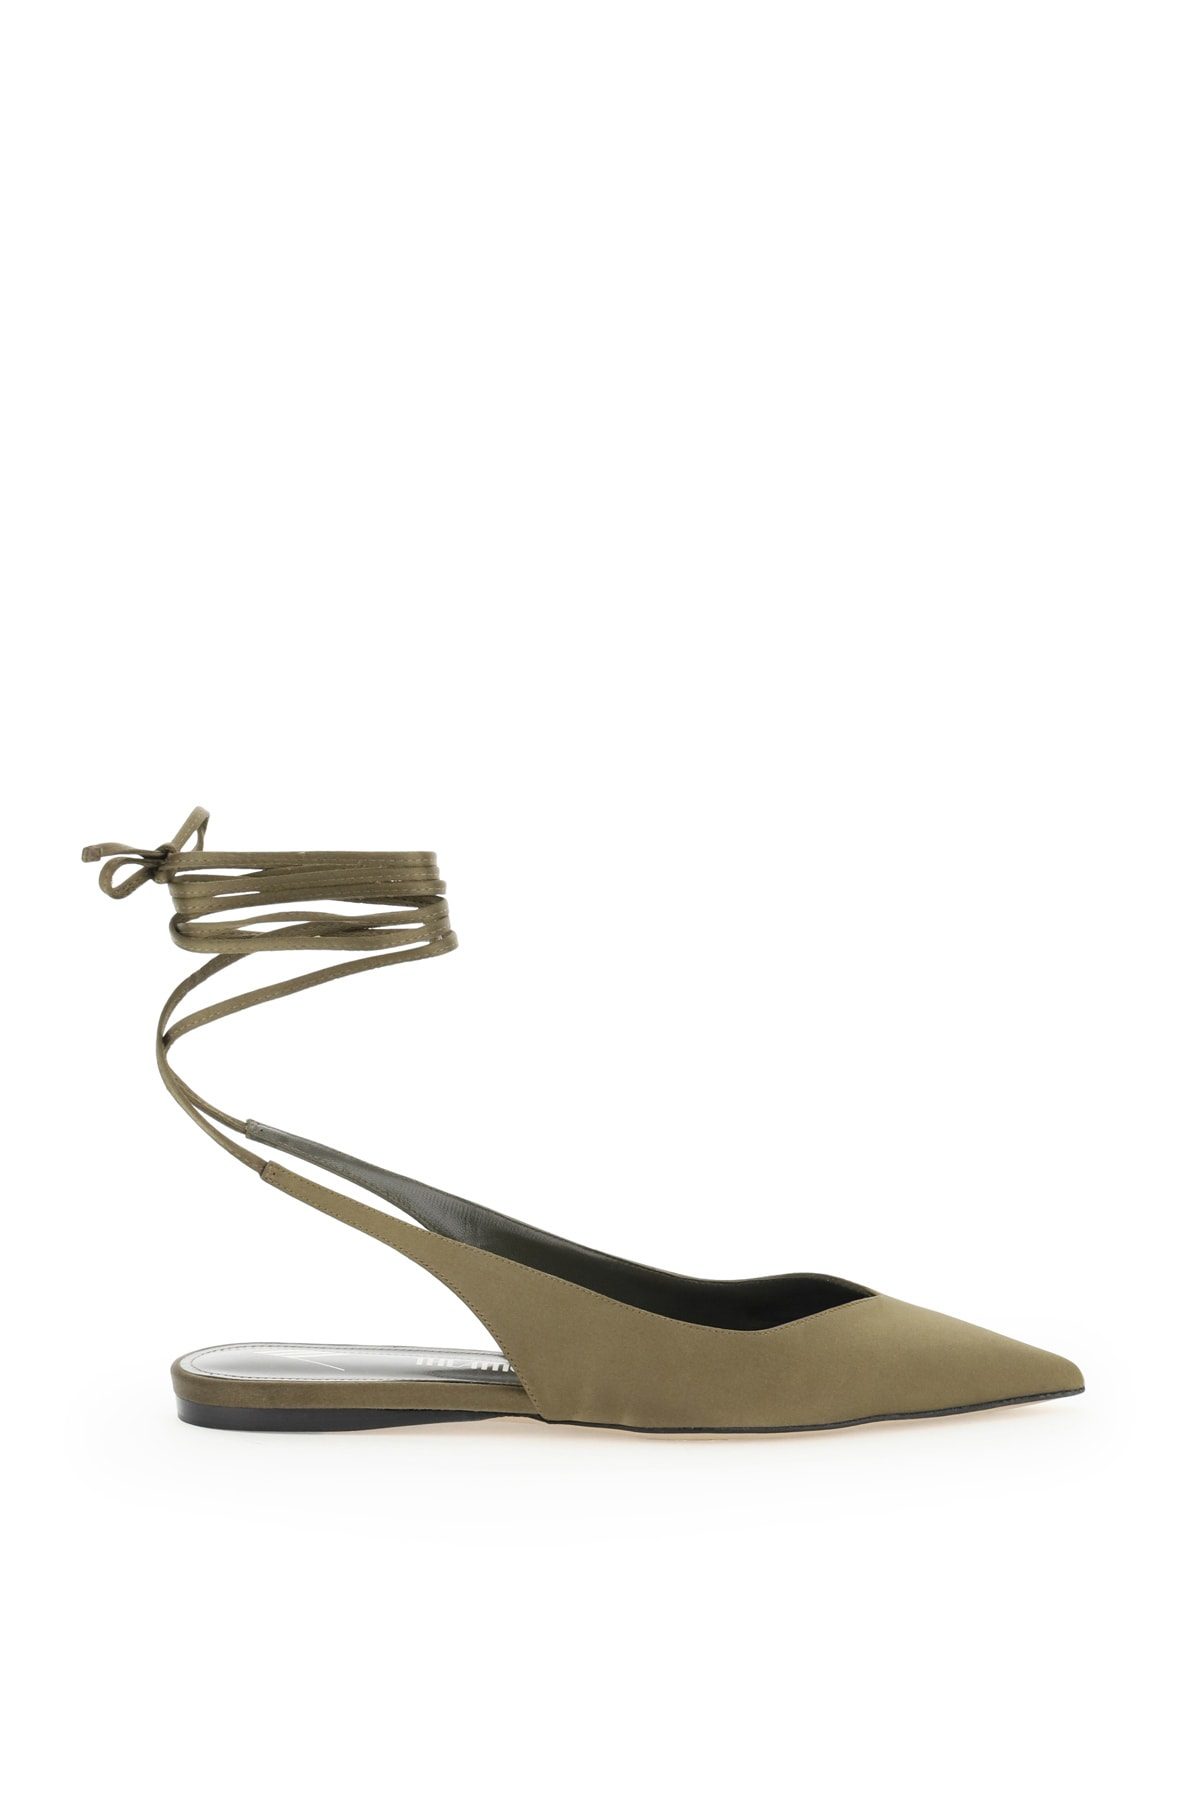 Attico Shoes VENUS SATIN SLINGBACK FLATS